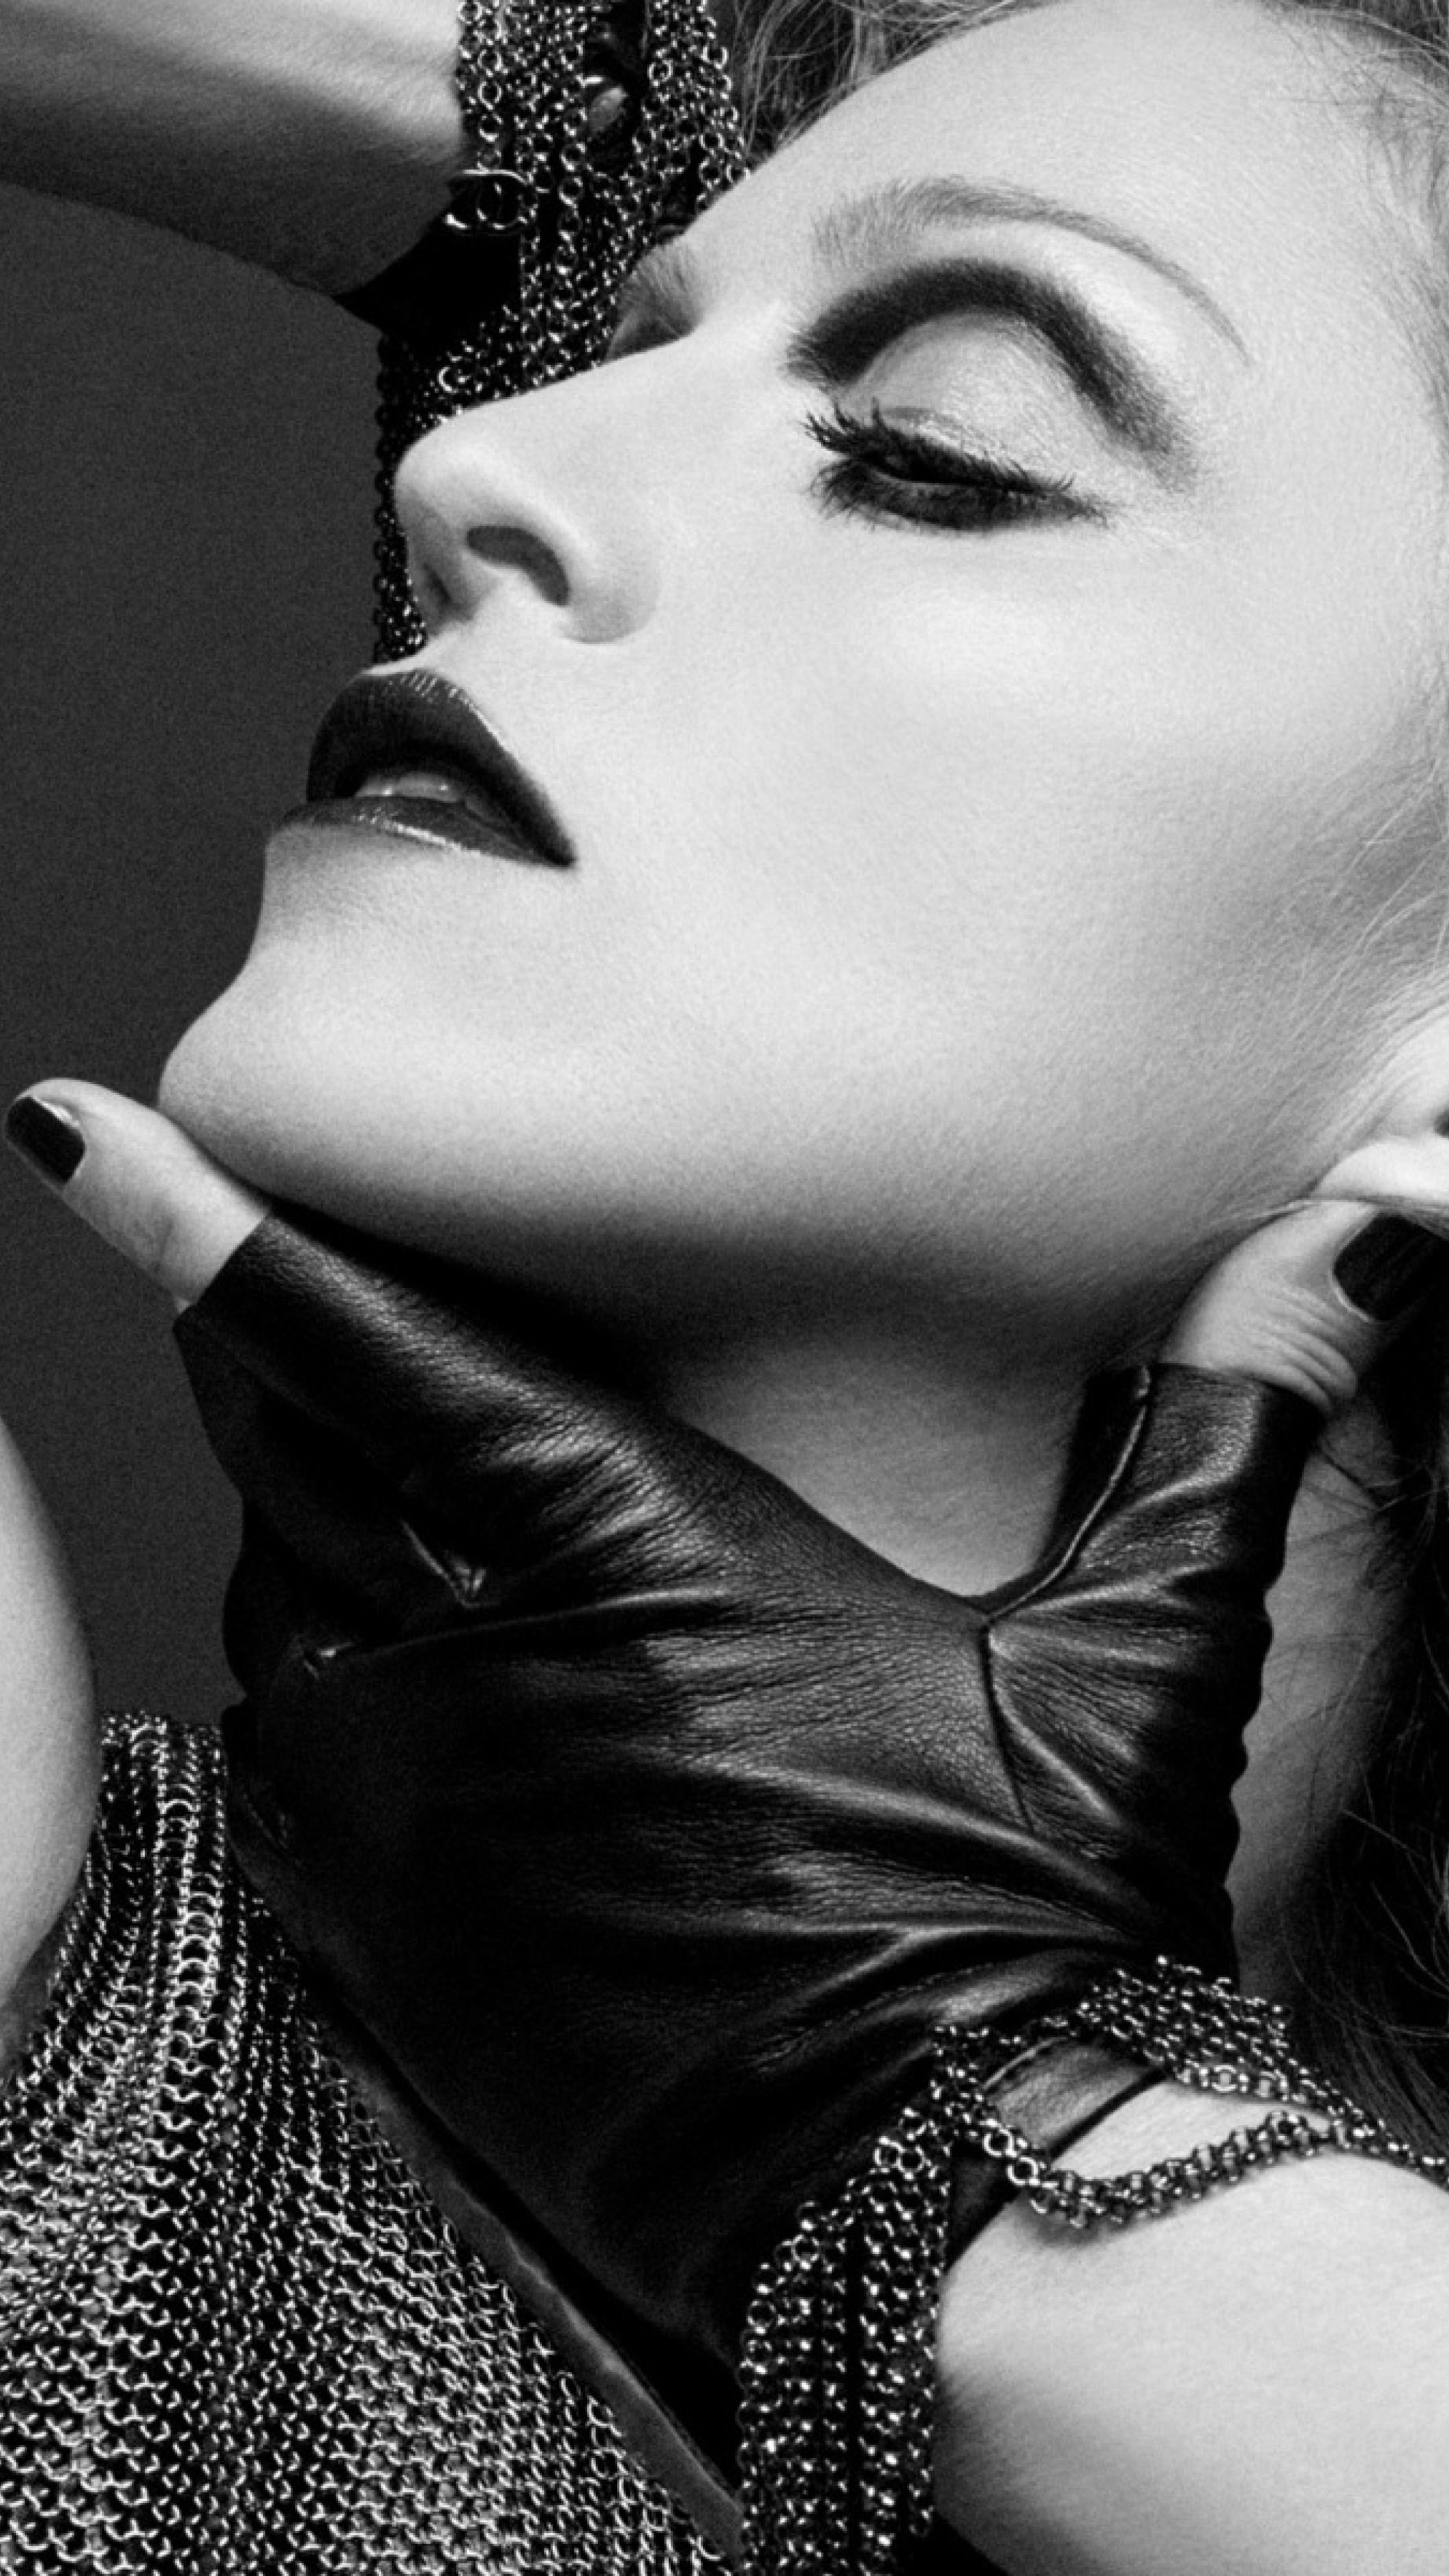 Madonna Black And White Portrait Photoshoot, Full HD Wallpaper